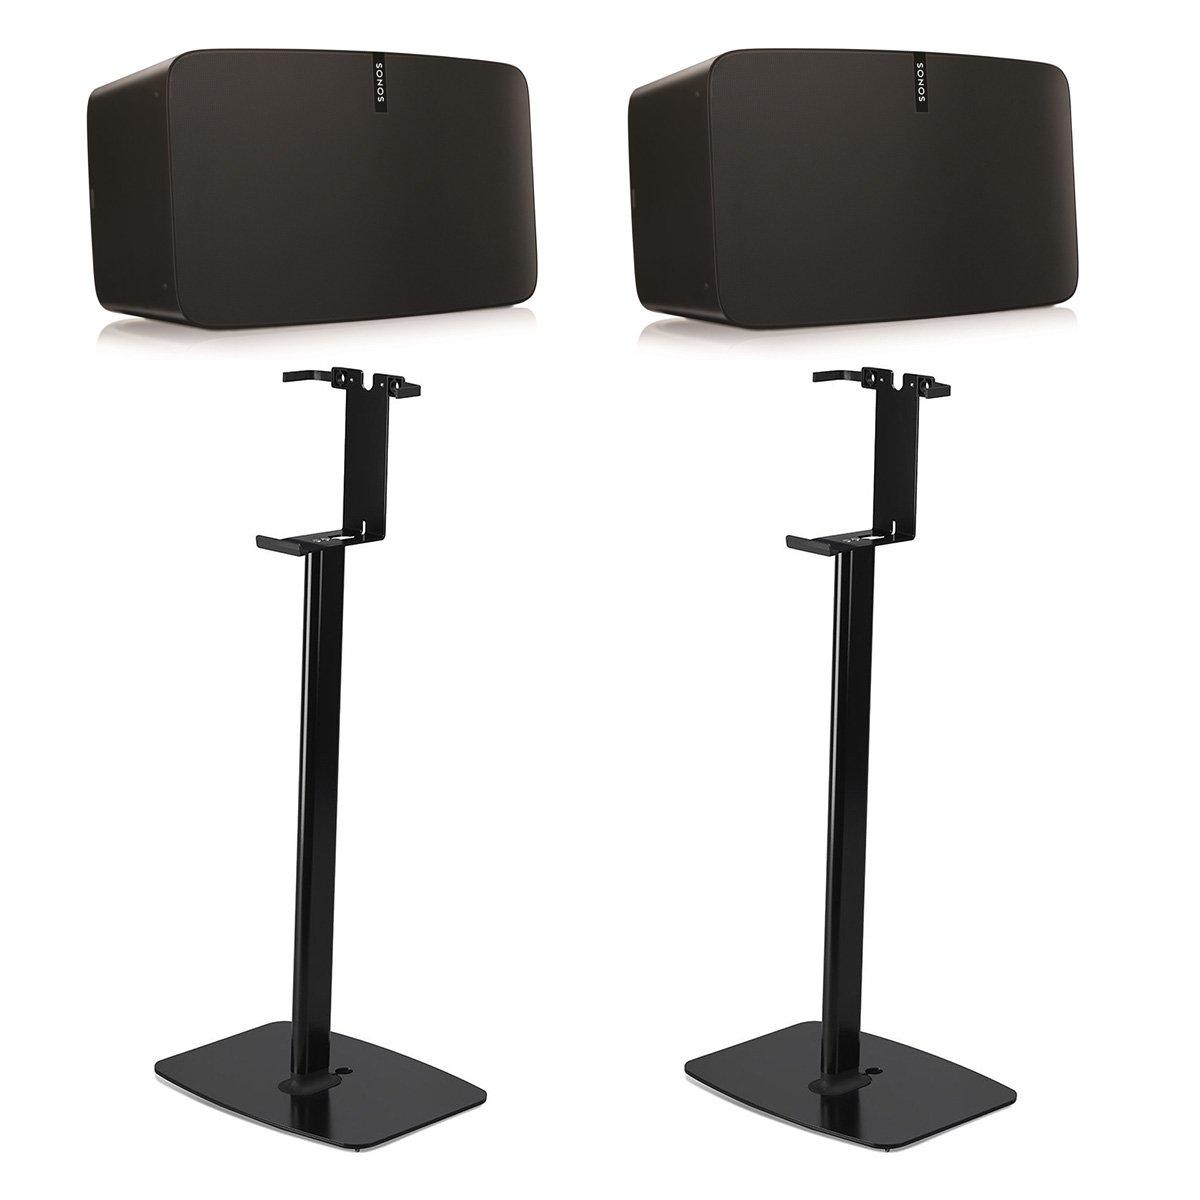 Sonos PLAY:5 Wireless Smart Speakers with Flexson Vertical Floor Stands - Pair (Black)